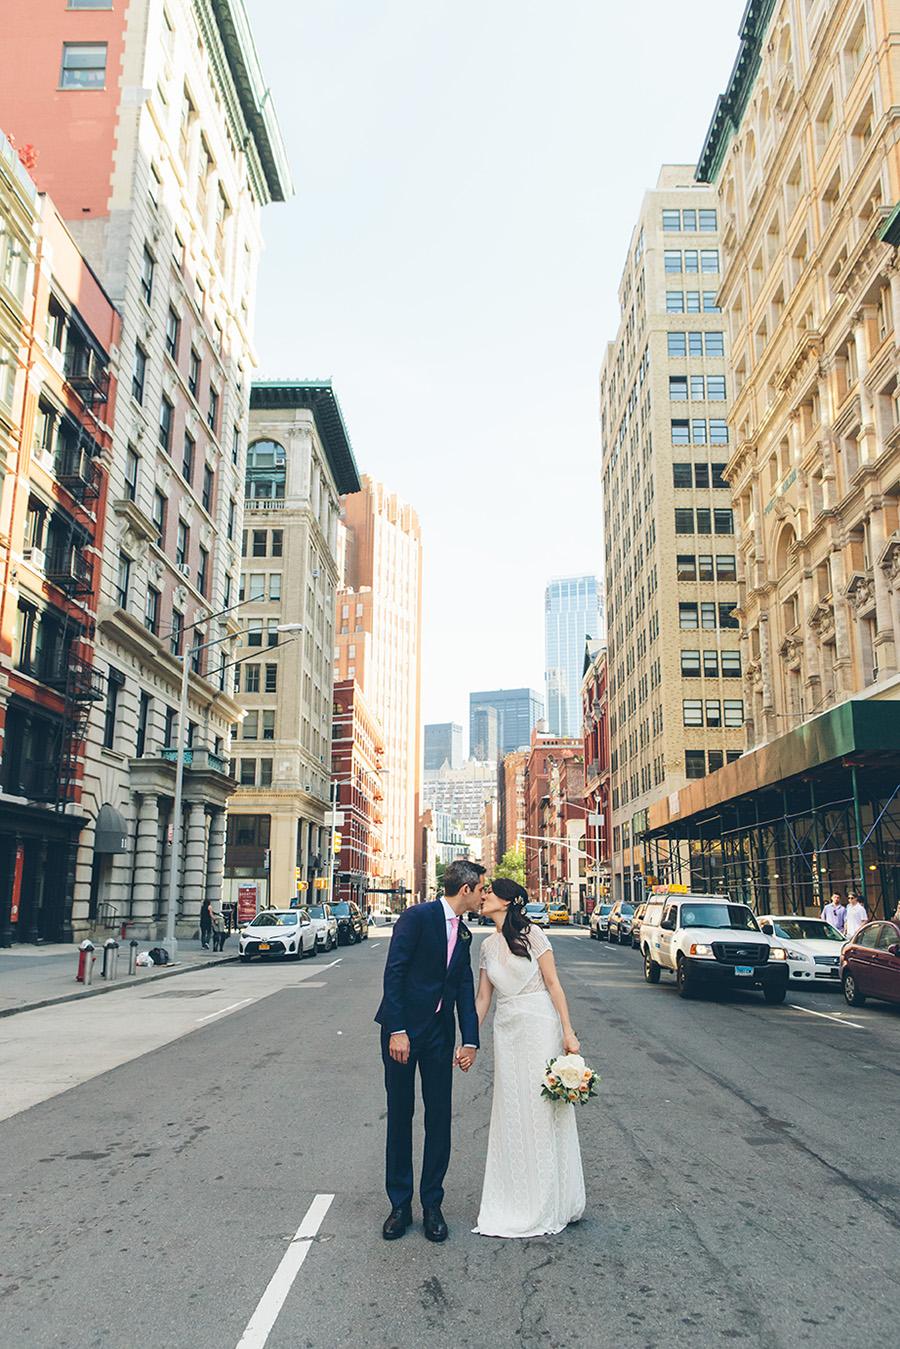 NEW-YORK-CITY-WEDDING-PHOTOGRAPHER-WEST-VILLAGE-GREENWICH-HOTEL-GRAND-BANKS-PIER-0049.jpg